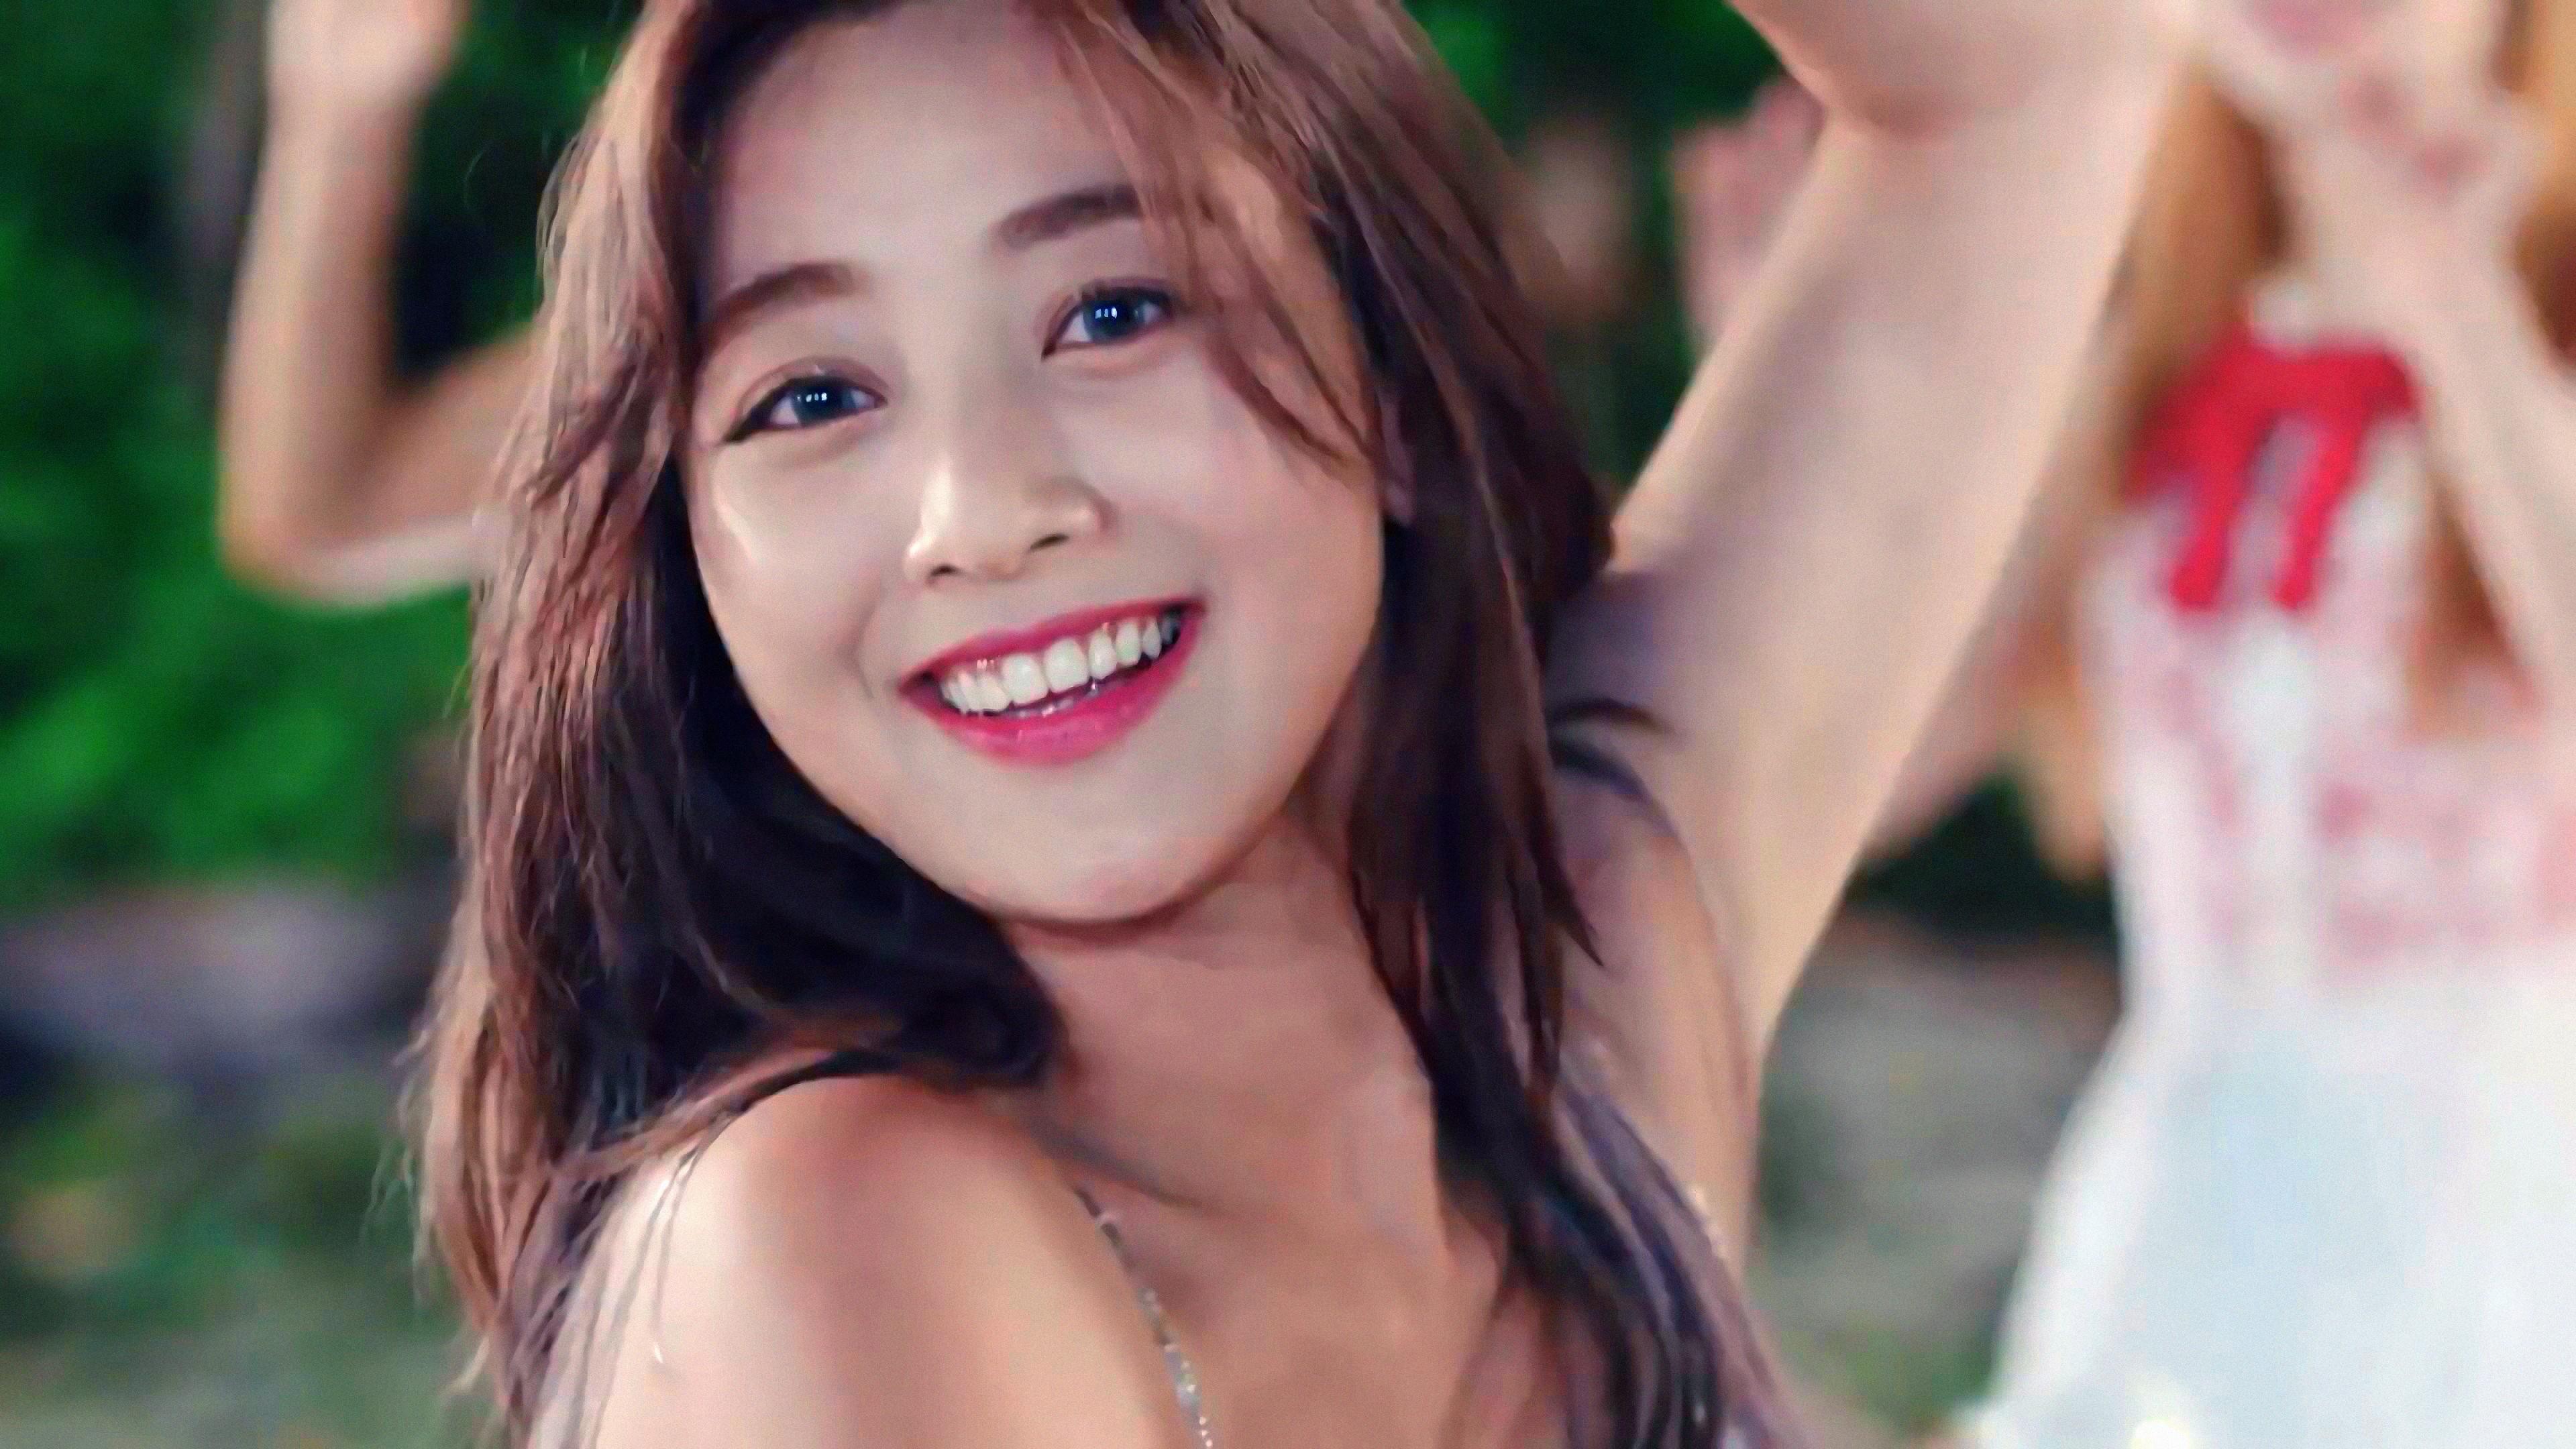 Jihyo Park Ji Hyo 4K 8K HD Wallpaper 3840x2160